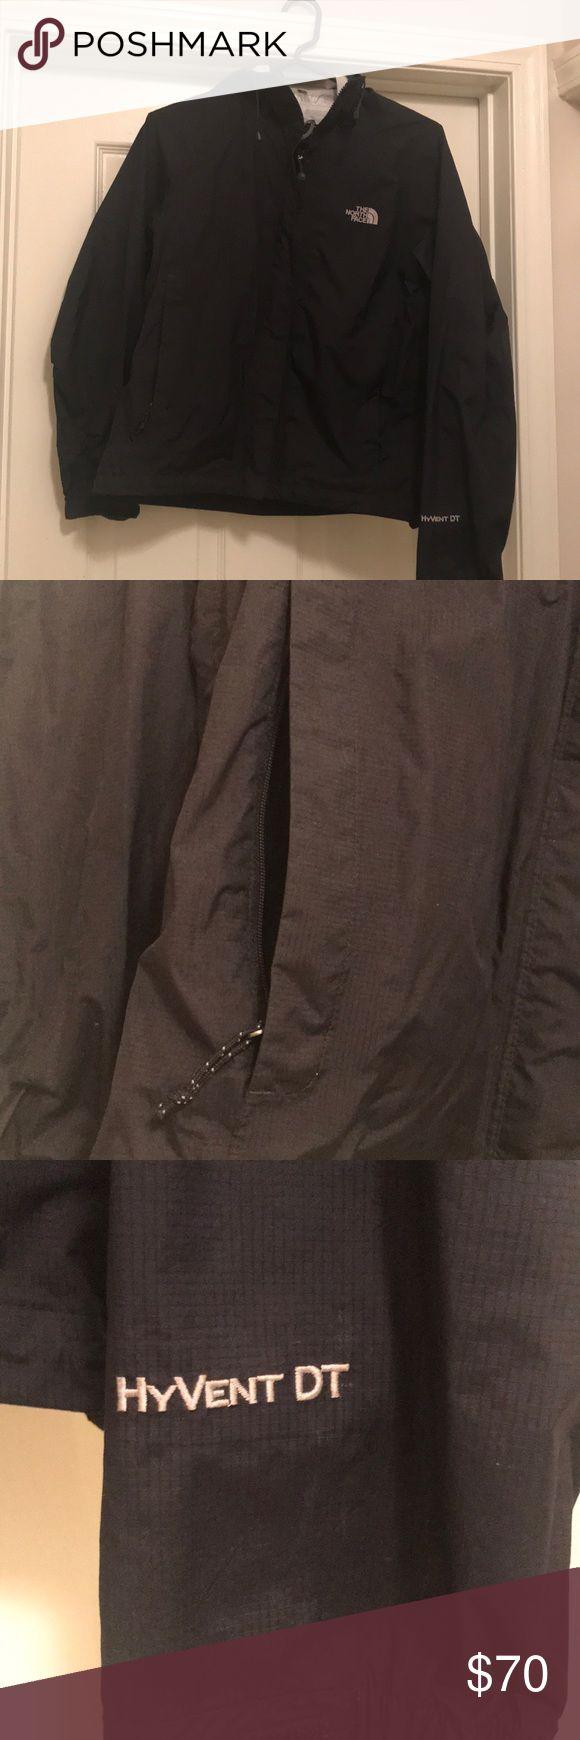 North Face Black Rain Jacket Amazing basic rain jacket. Just looking for something new! Great used condition. North Face Jackets & Coats